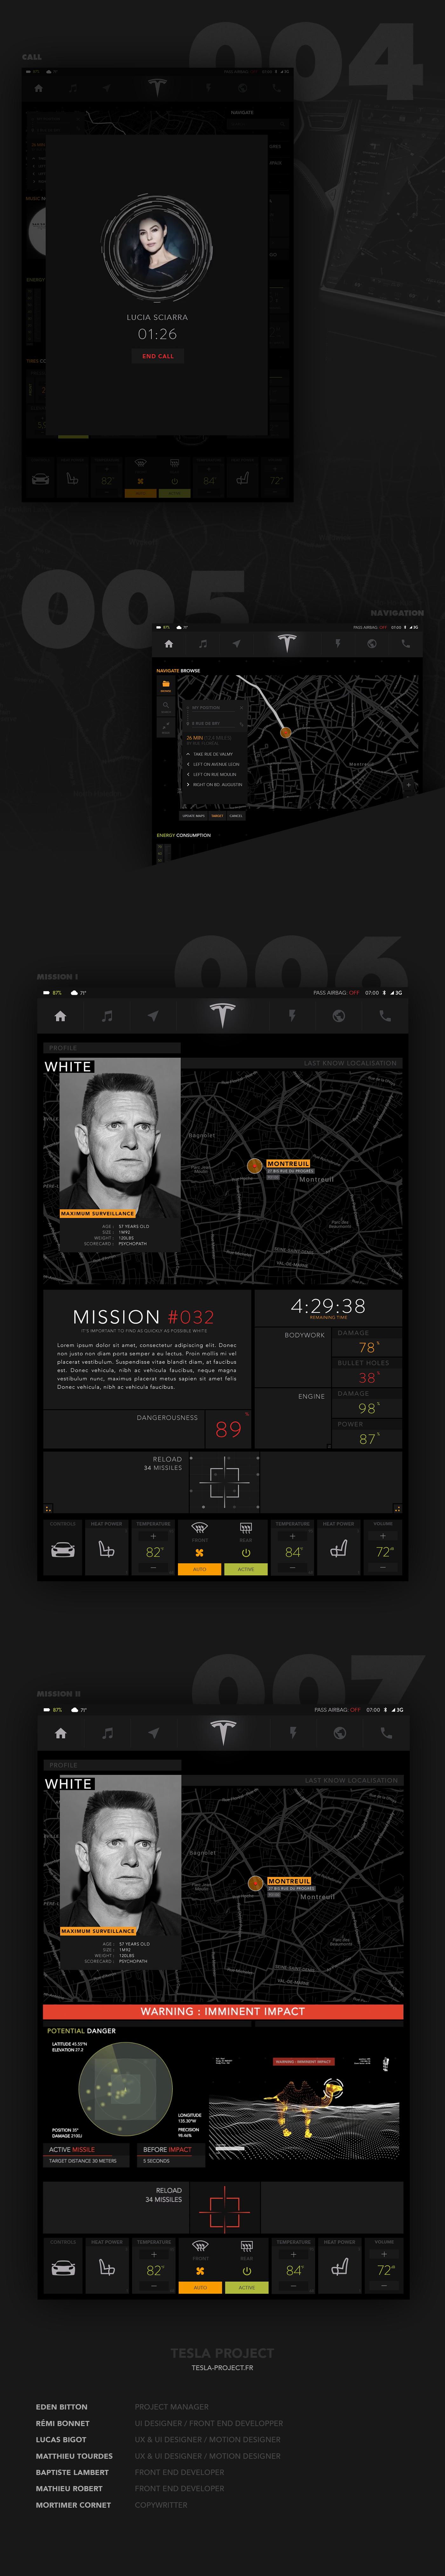 redesign Interface tesla spectre motion design UI & UX interaction